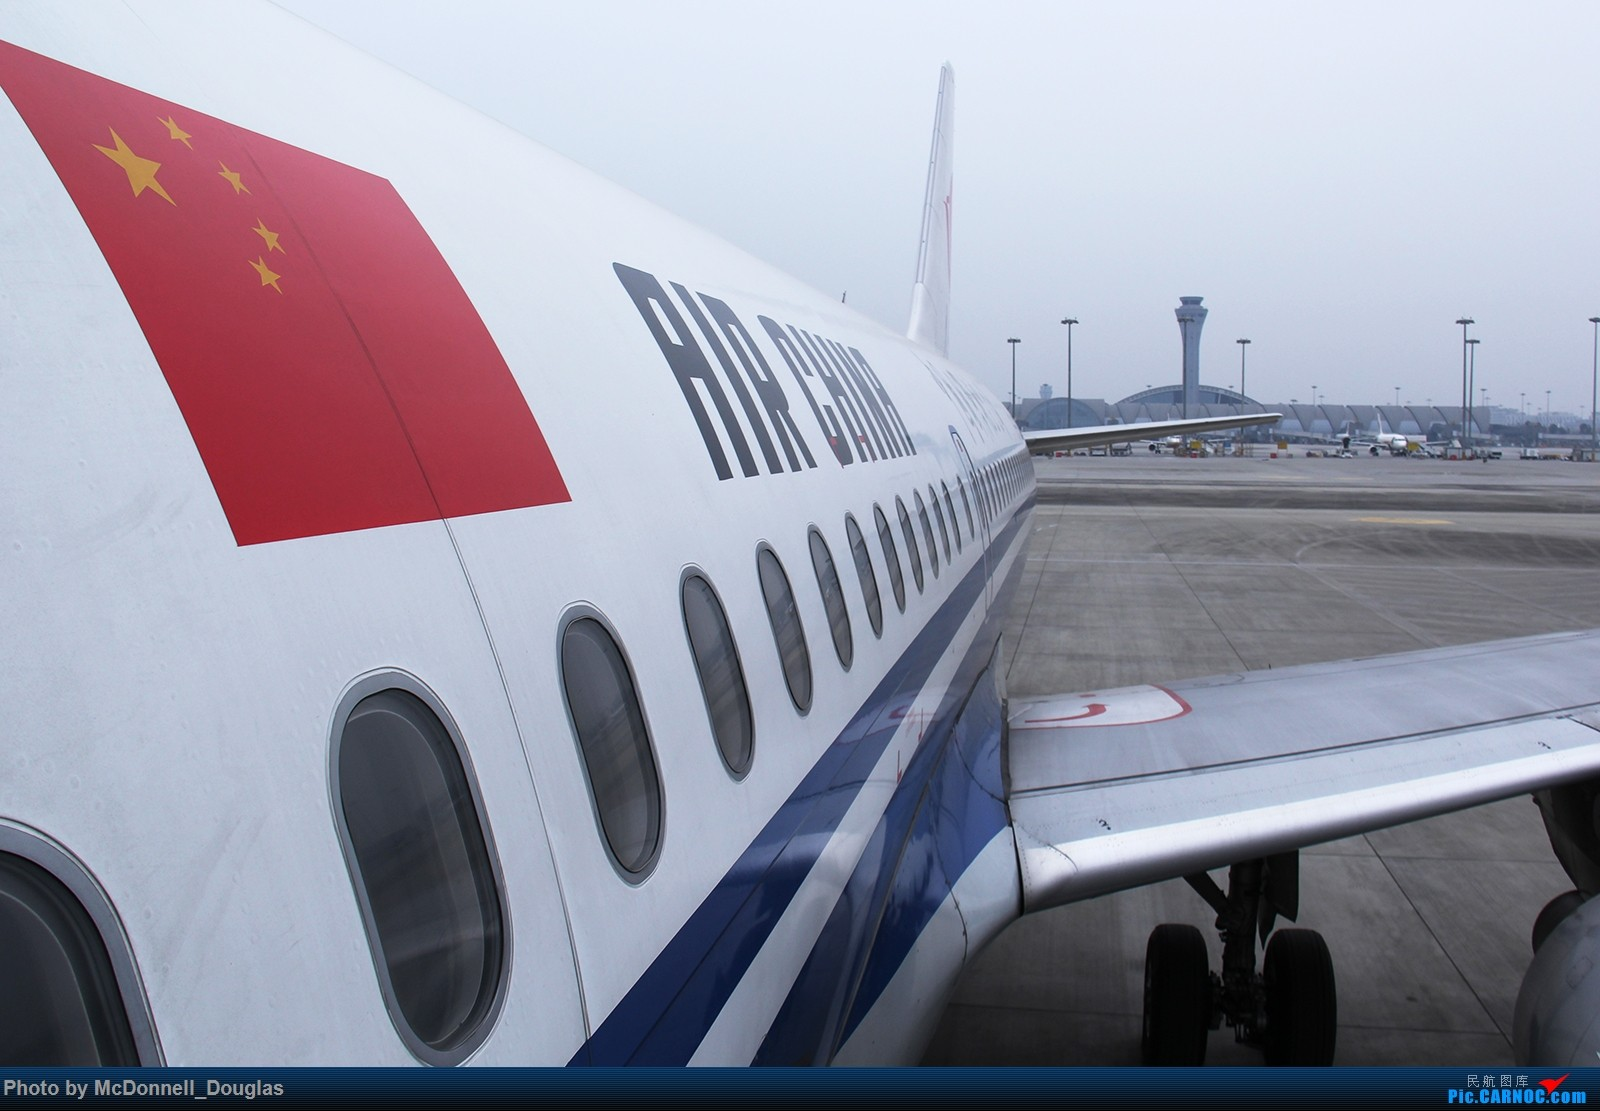 Re:[原创]【上海飞友会】【zc带你游天下(4)】不远千里飞跃喜马拉雅去看你,探寻高山另一边的神秘国度,和一群贫穷却快乐着的人们 AIRBUS A319-115 B-6226 中国成都双流国际机场